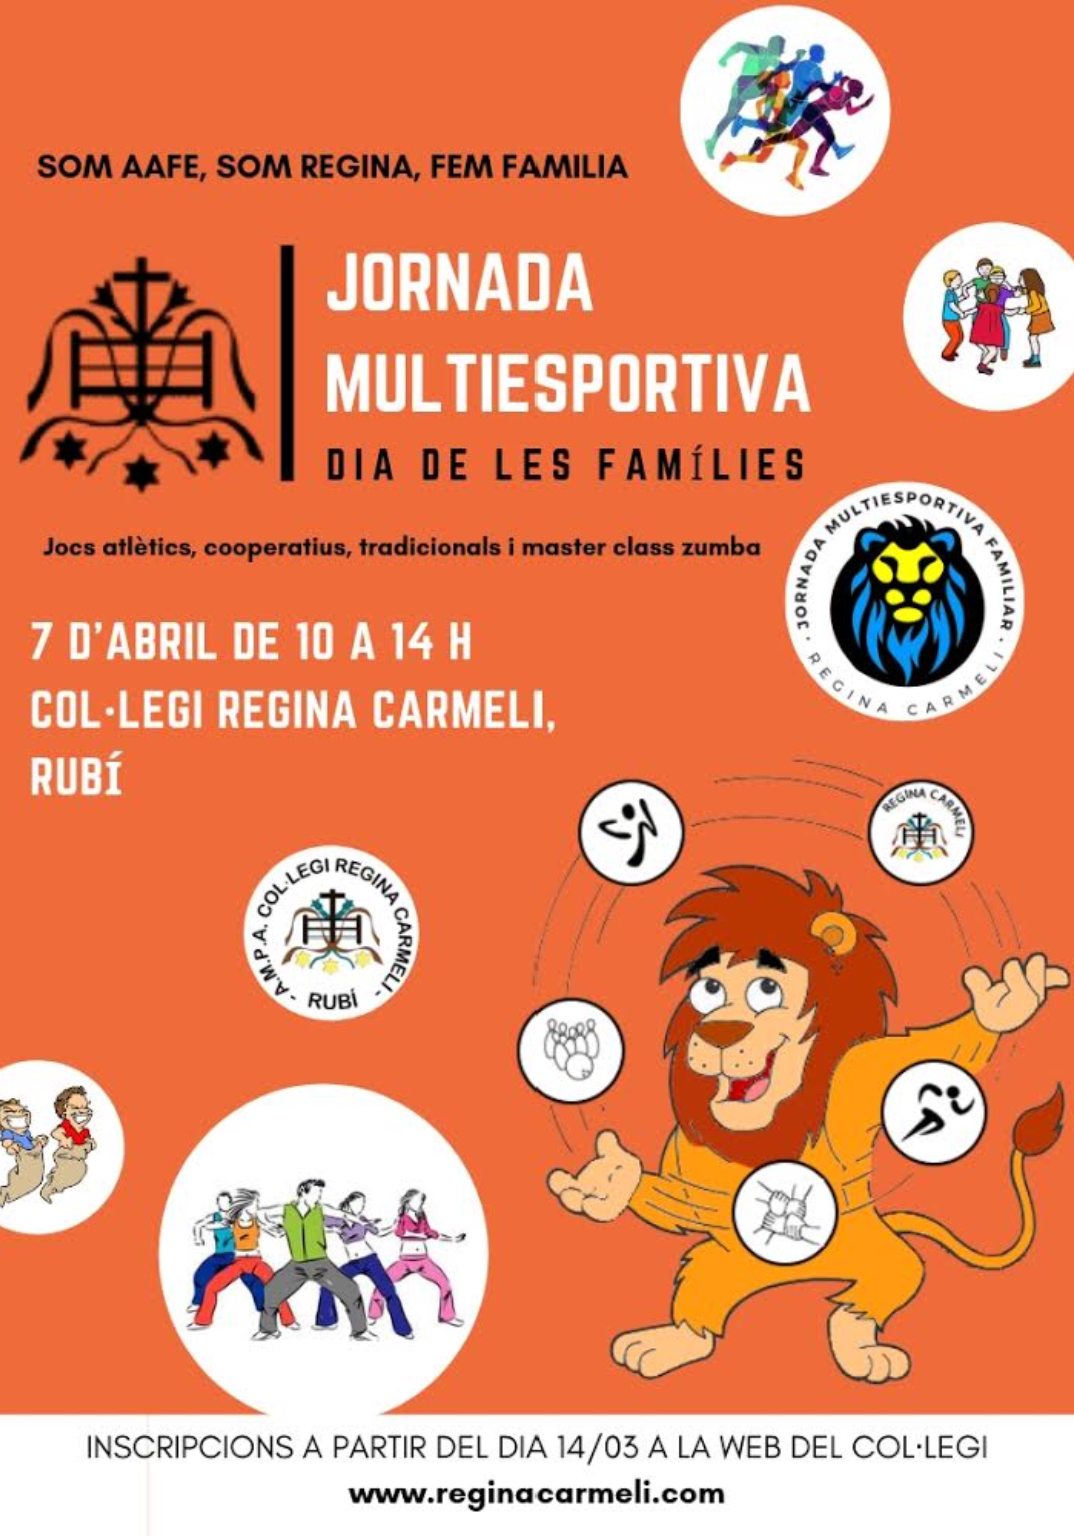 Jornada Multiesportiva 2019